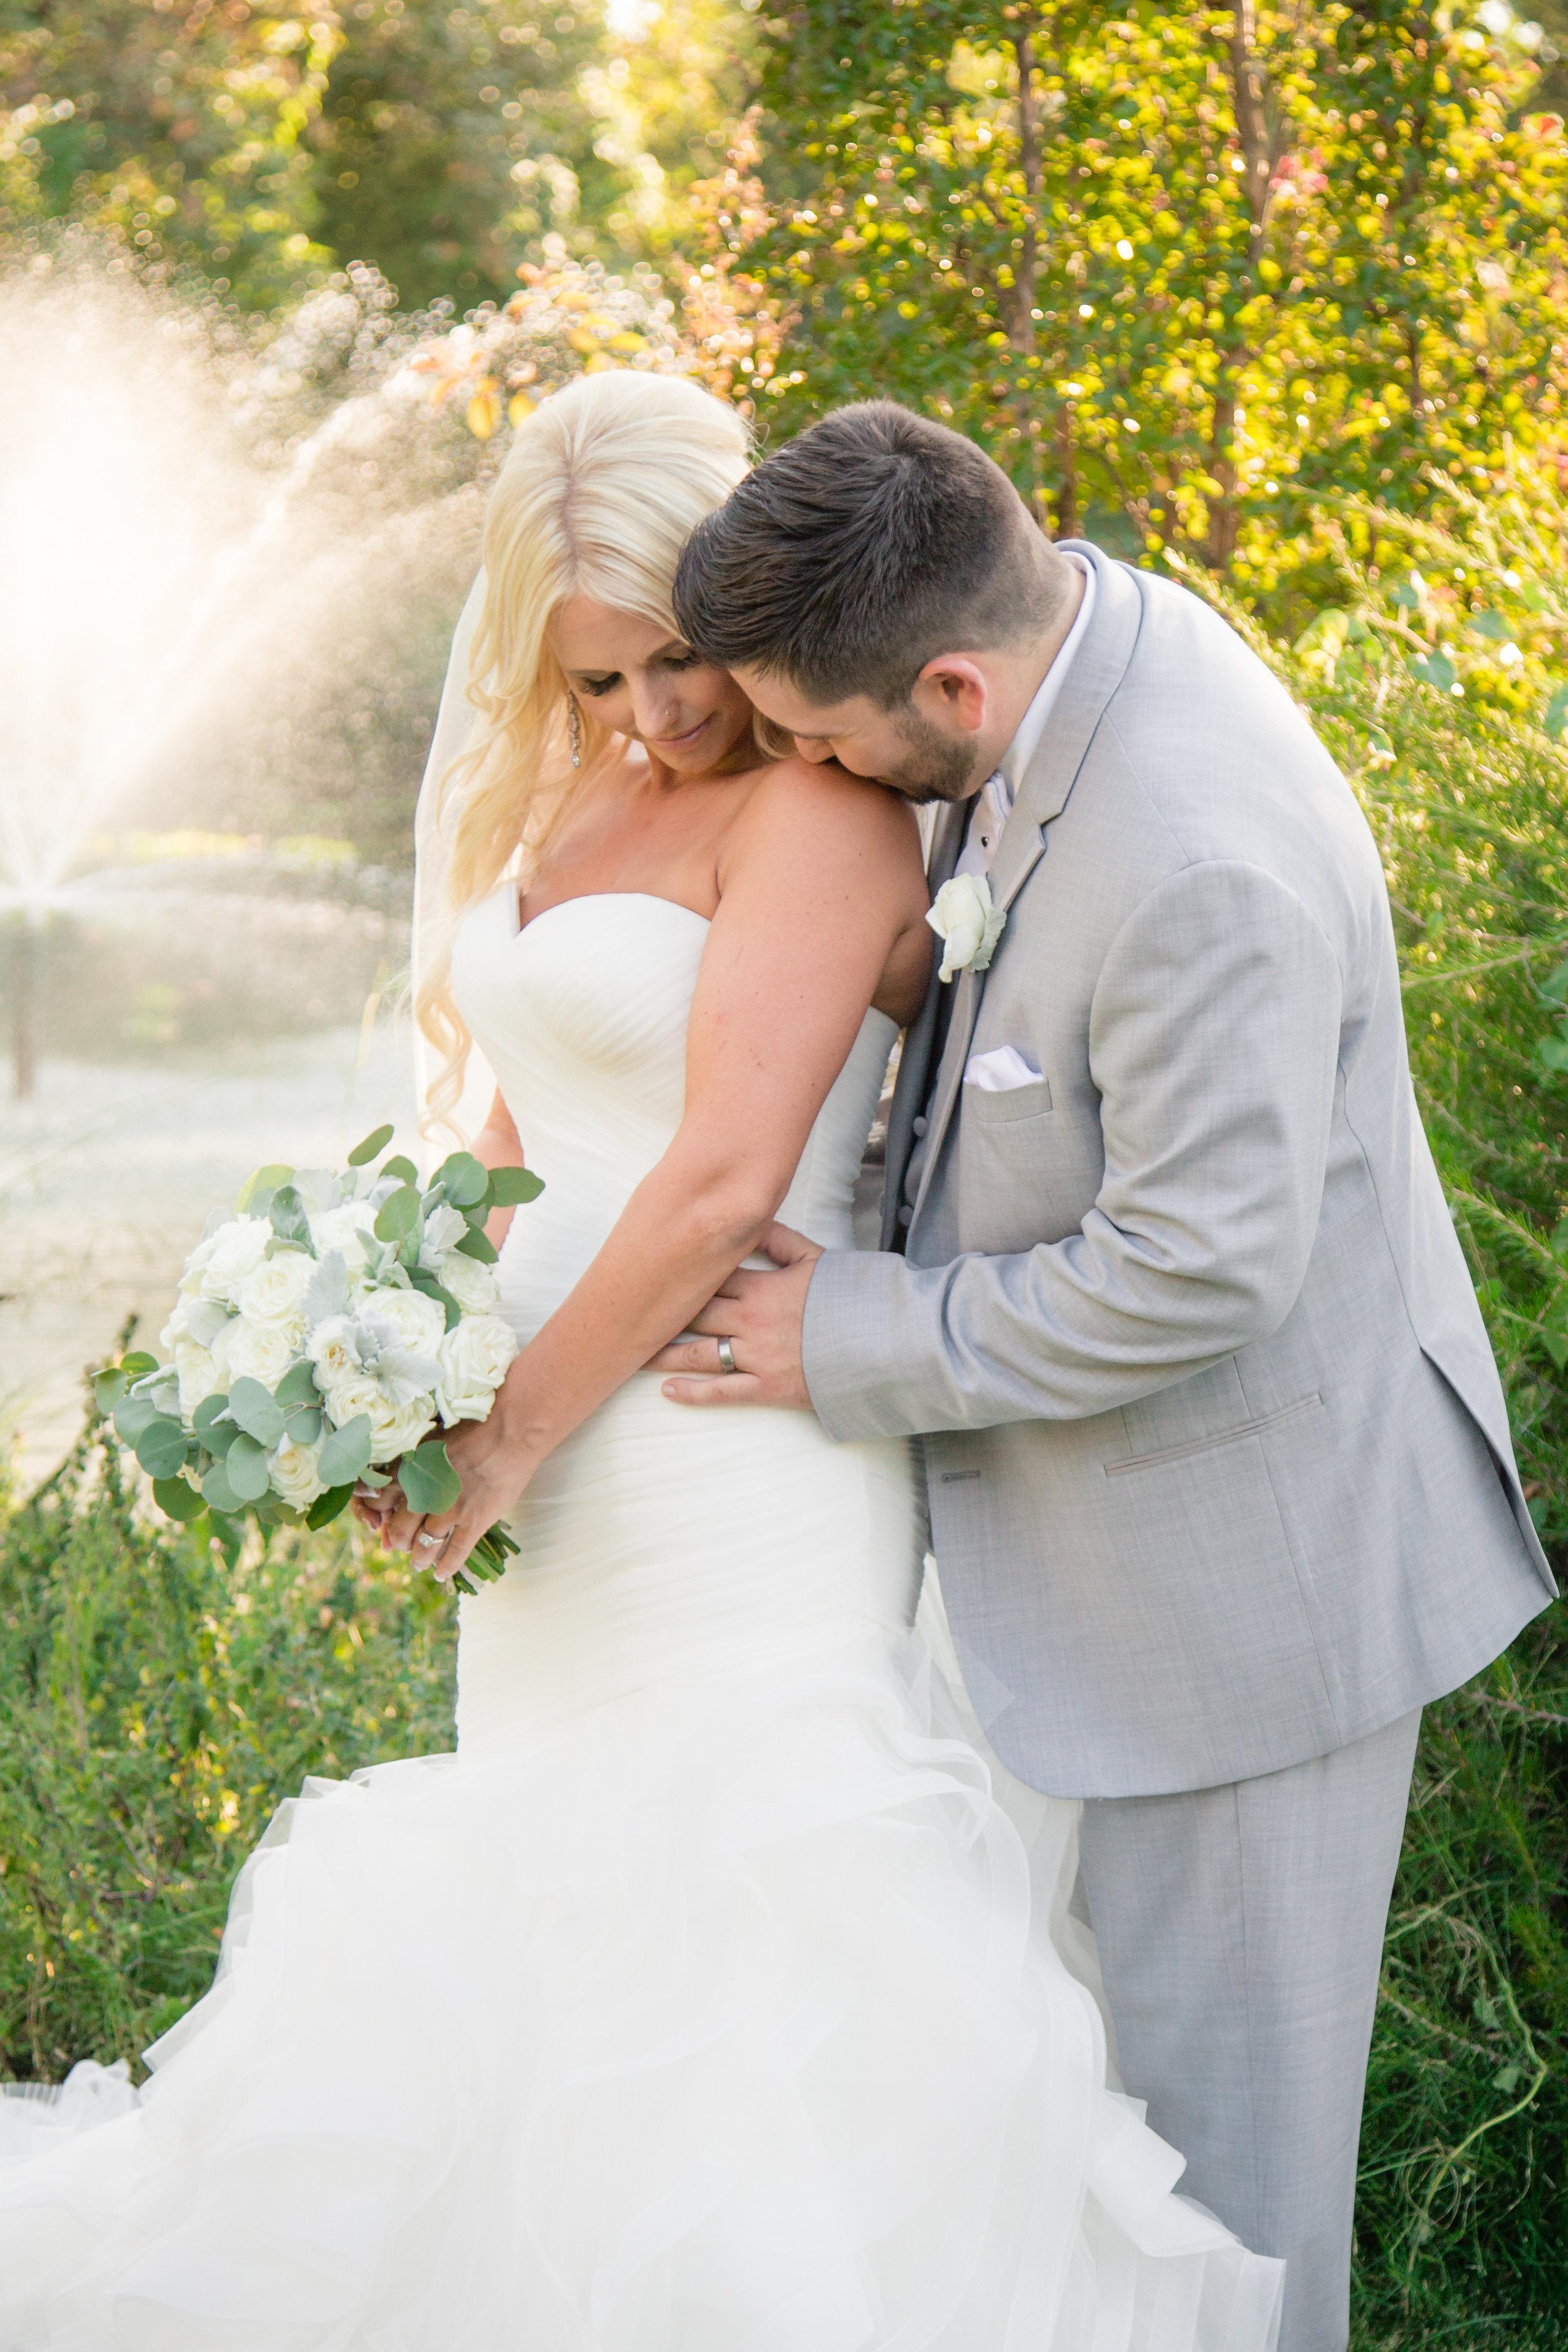 White Ranch Events - Chico - Ashley Teasley Photography - Sacramento Wedding Photographer19.JPG